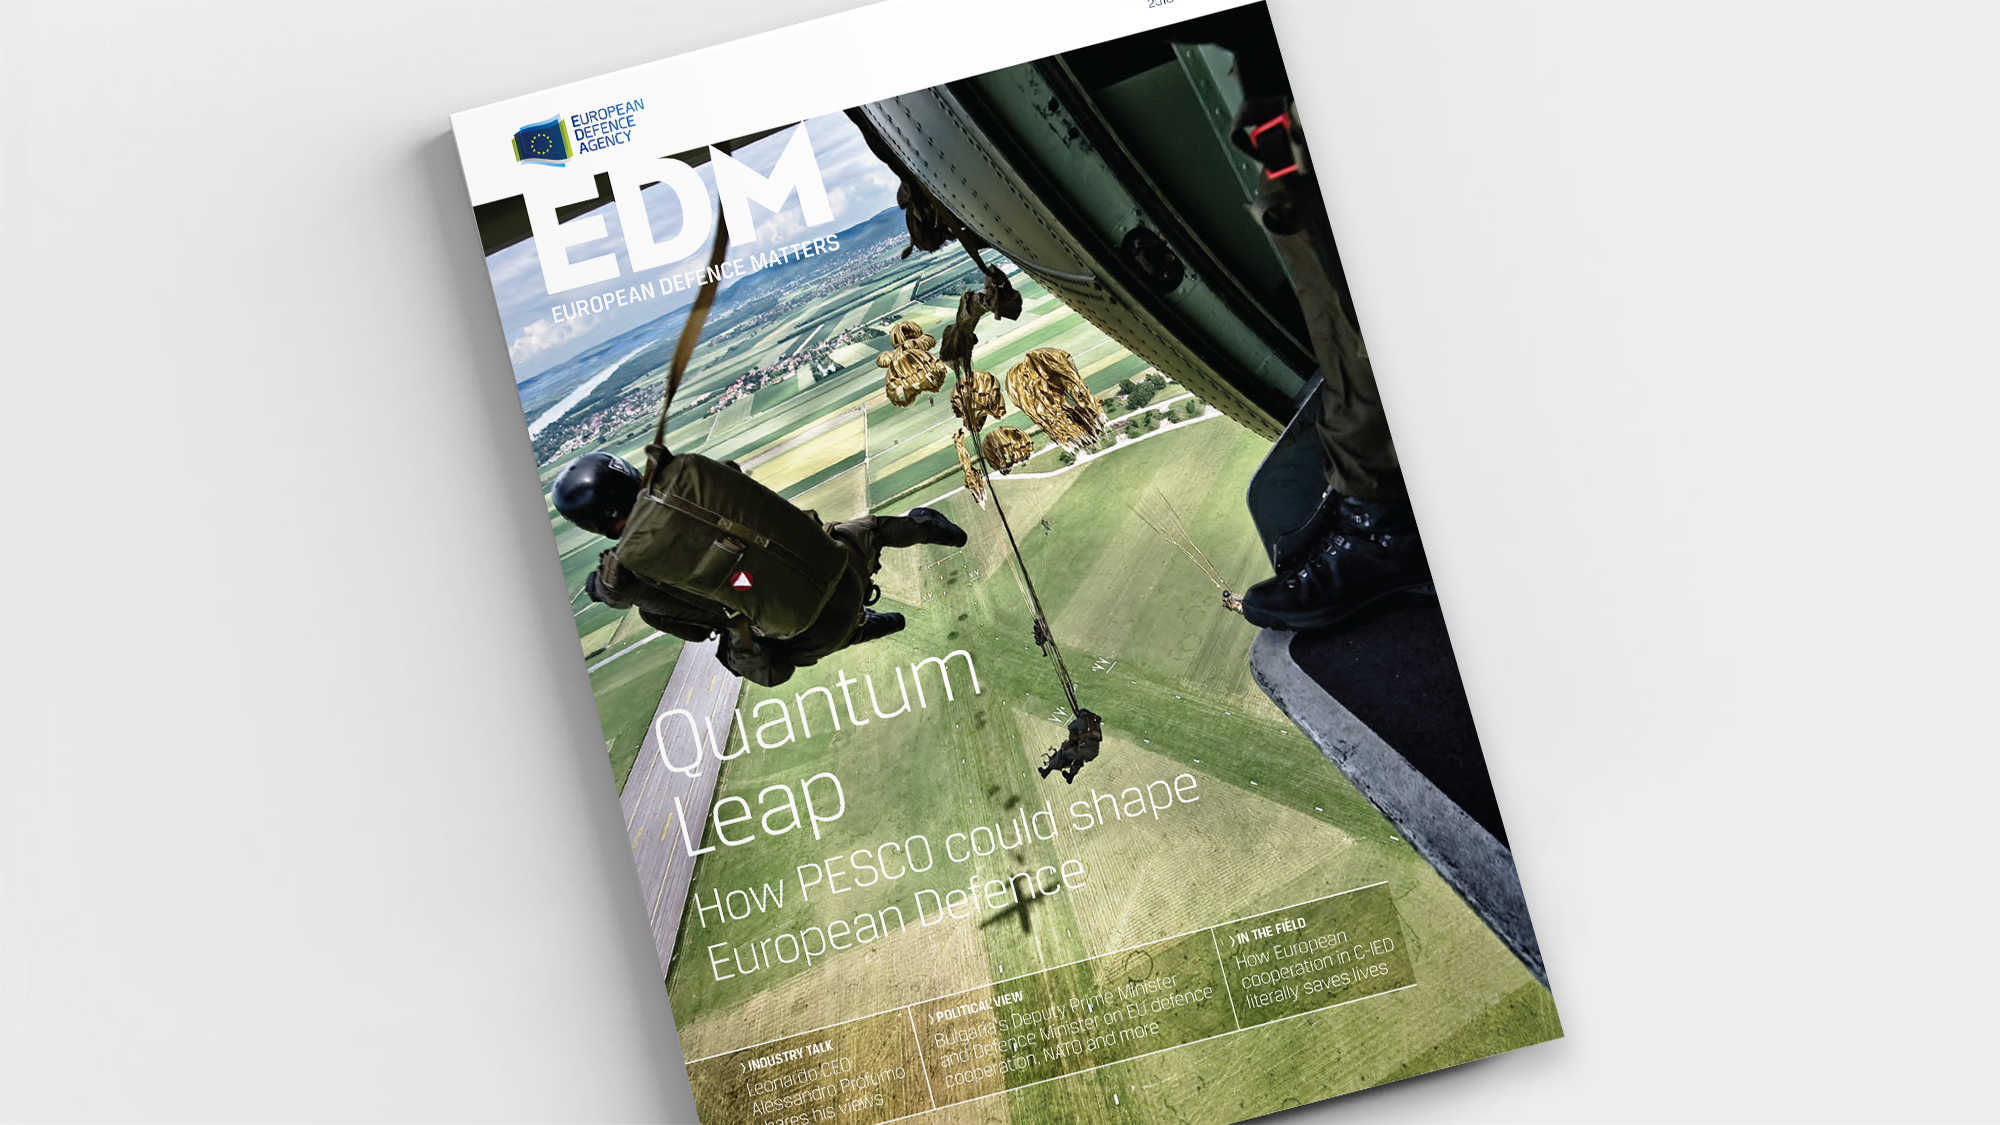 EDM Magazine issue 15